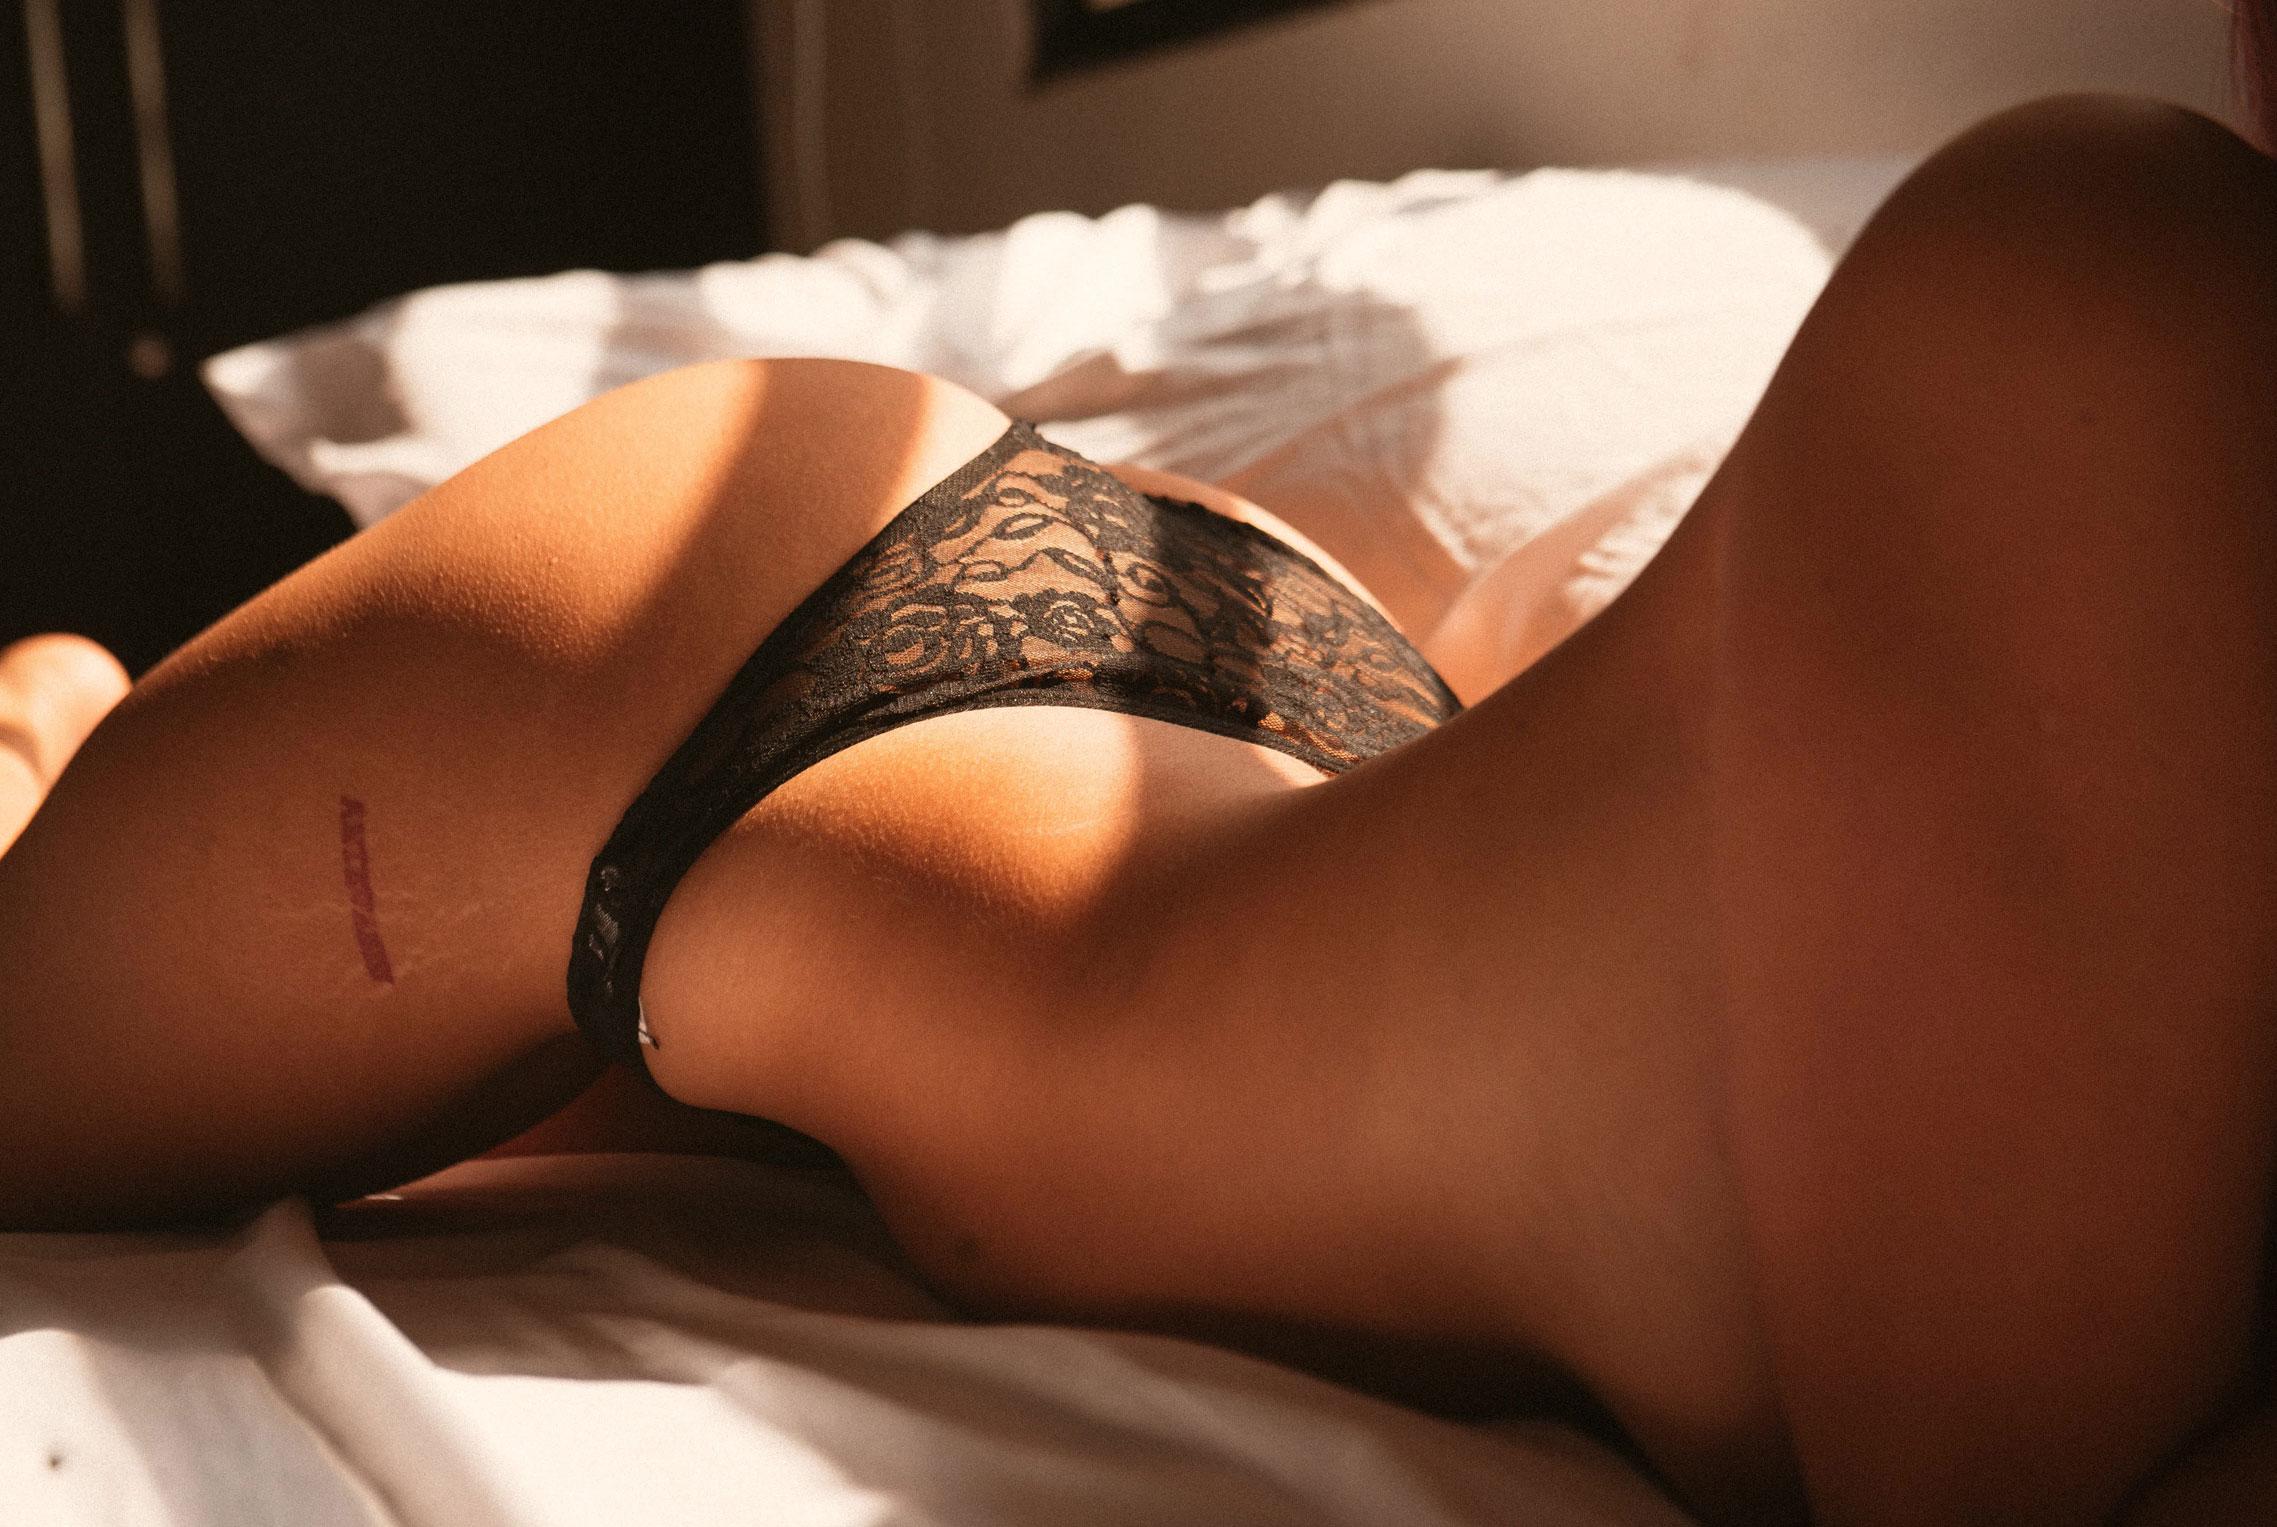 Hot Sunday / Heydi Veintimilla nude by Josua Gomez